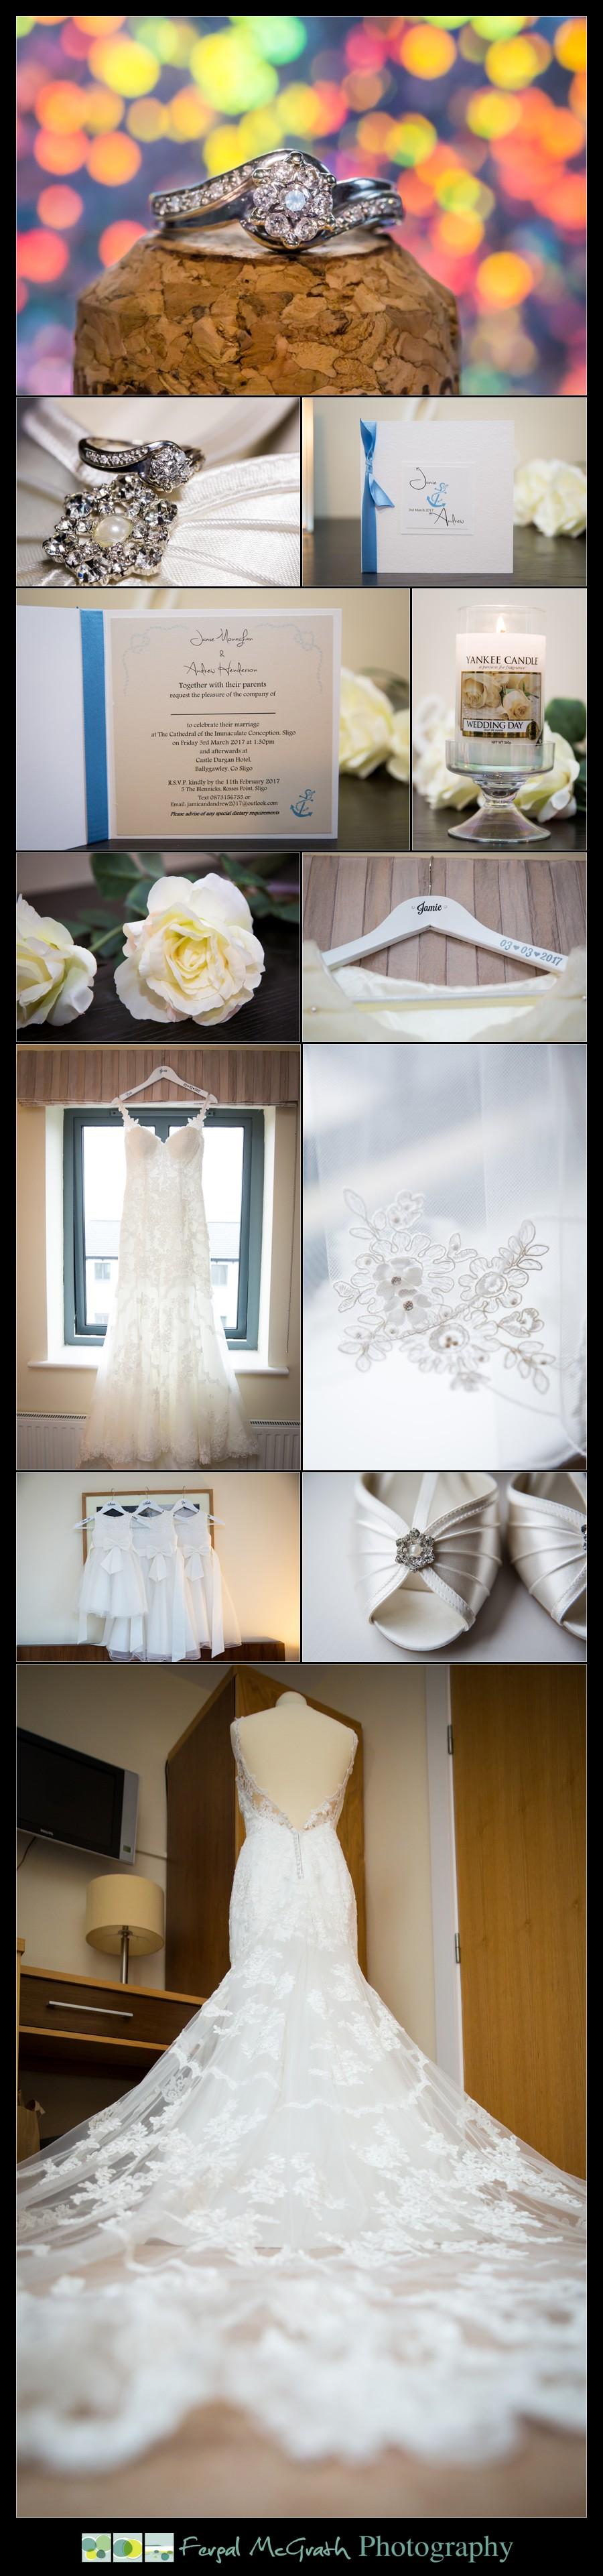 Castle Dargan Hotel Wedding Jamie and Andrew brides wedding dress